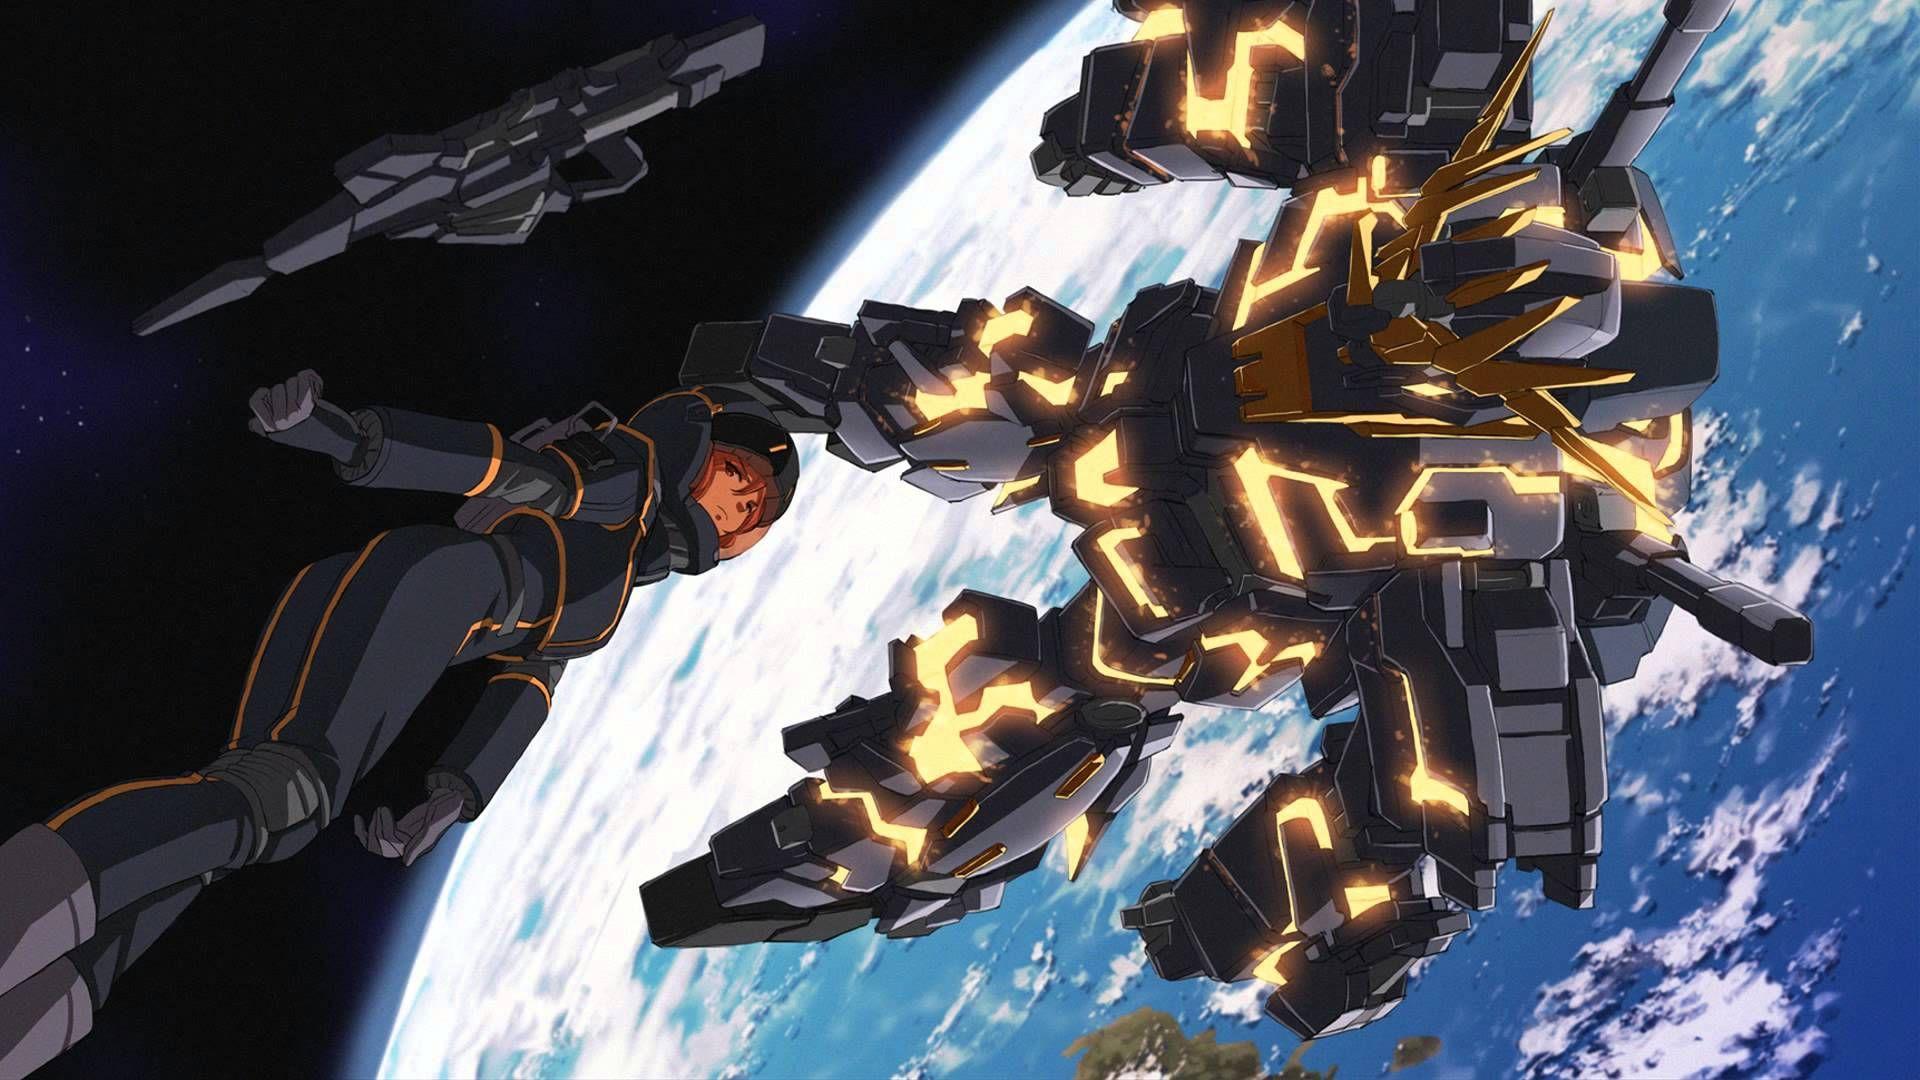 Banshee Gundam Unicorn Ost 3 1 High Quality 1080p Hd Unicorn Wallpaper Gundam Wallpapers Digital Artwork